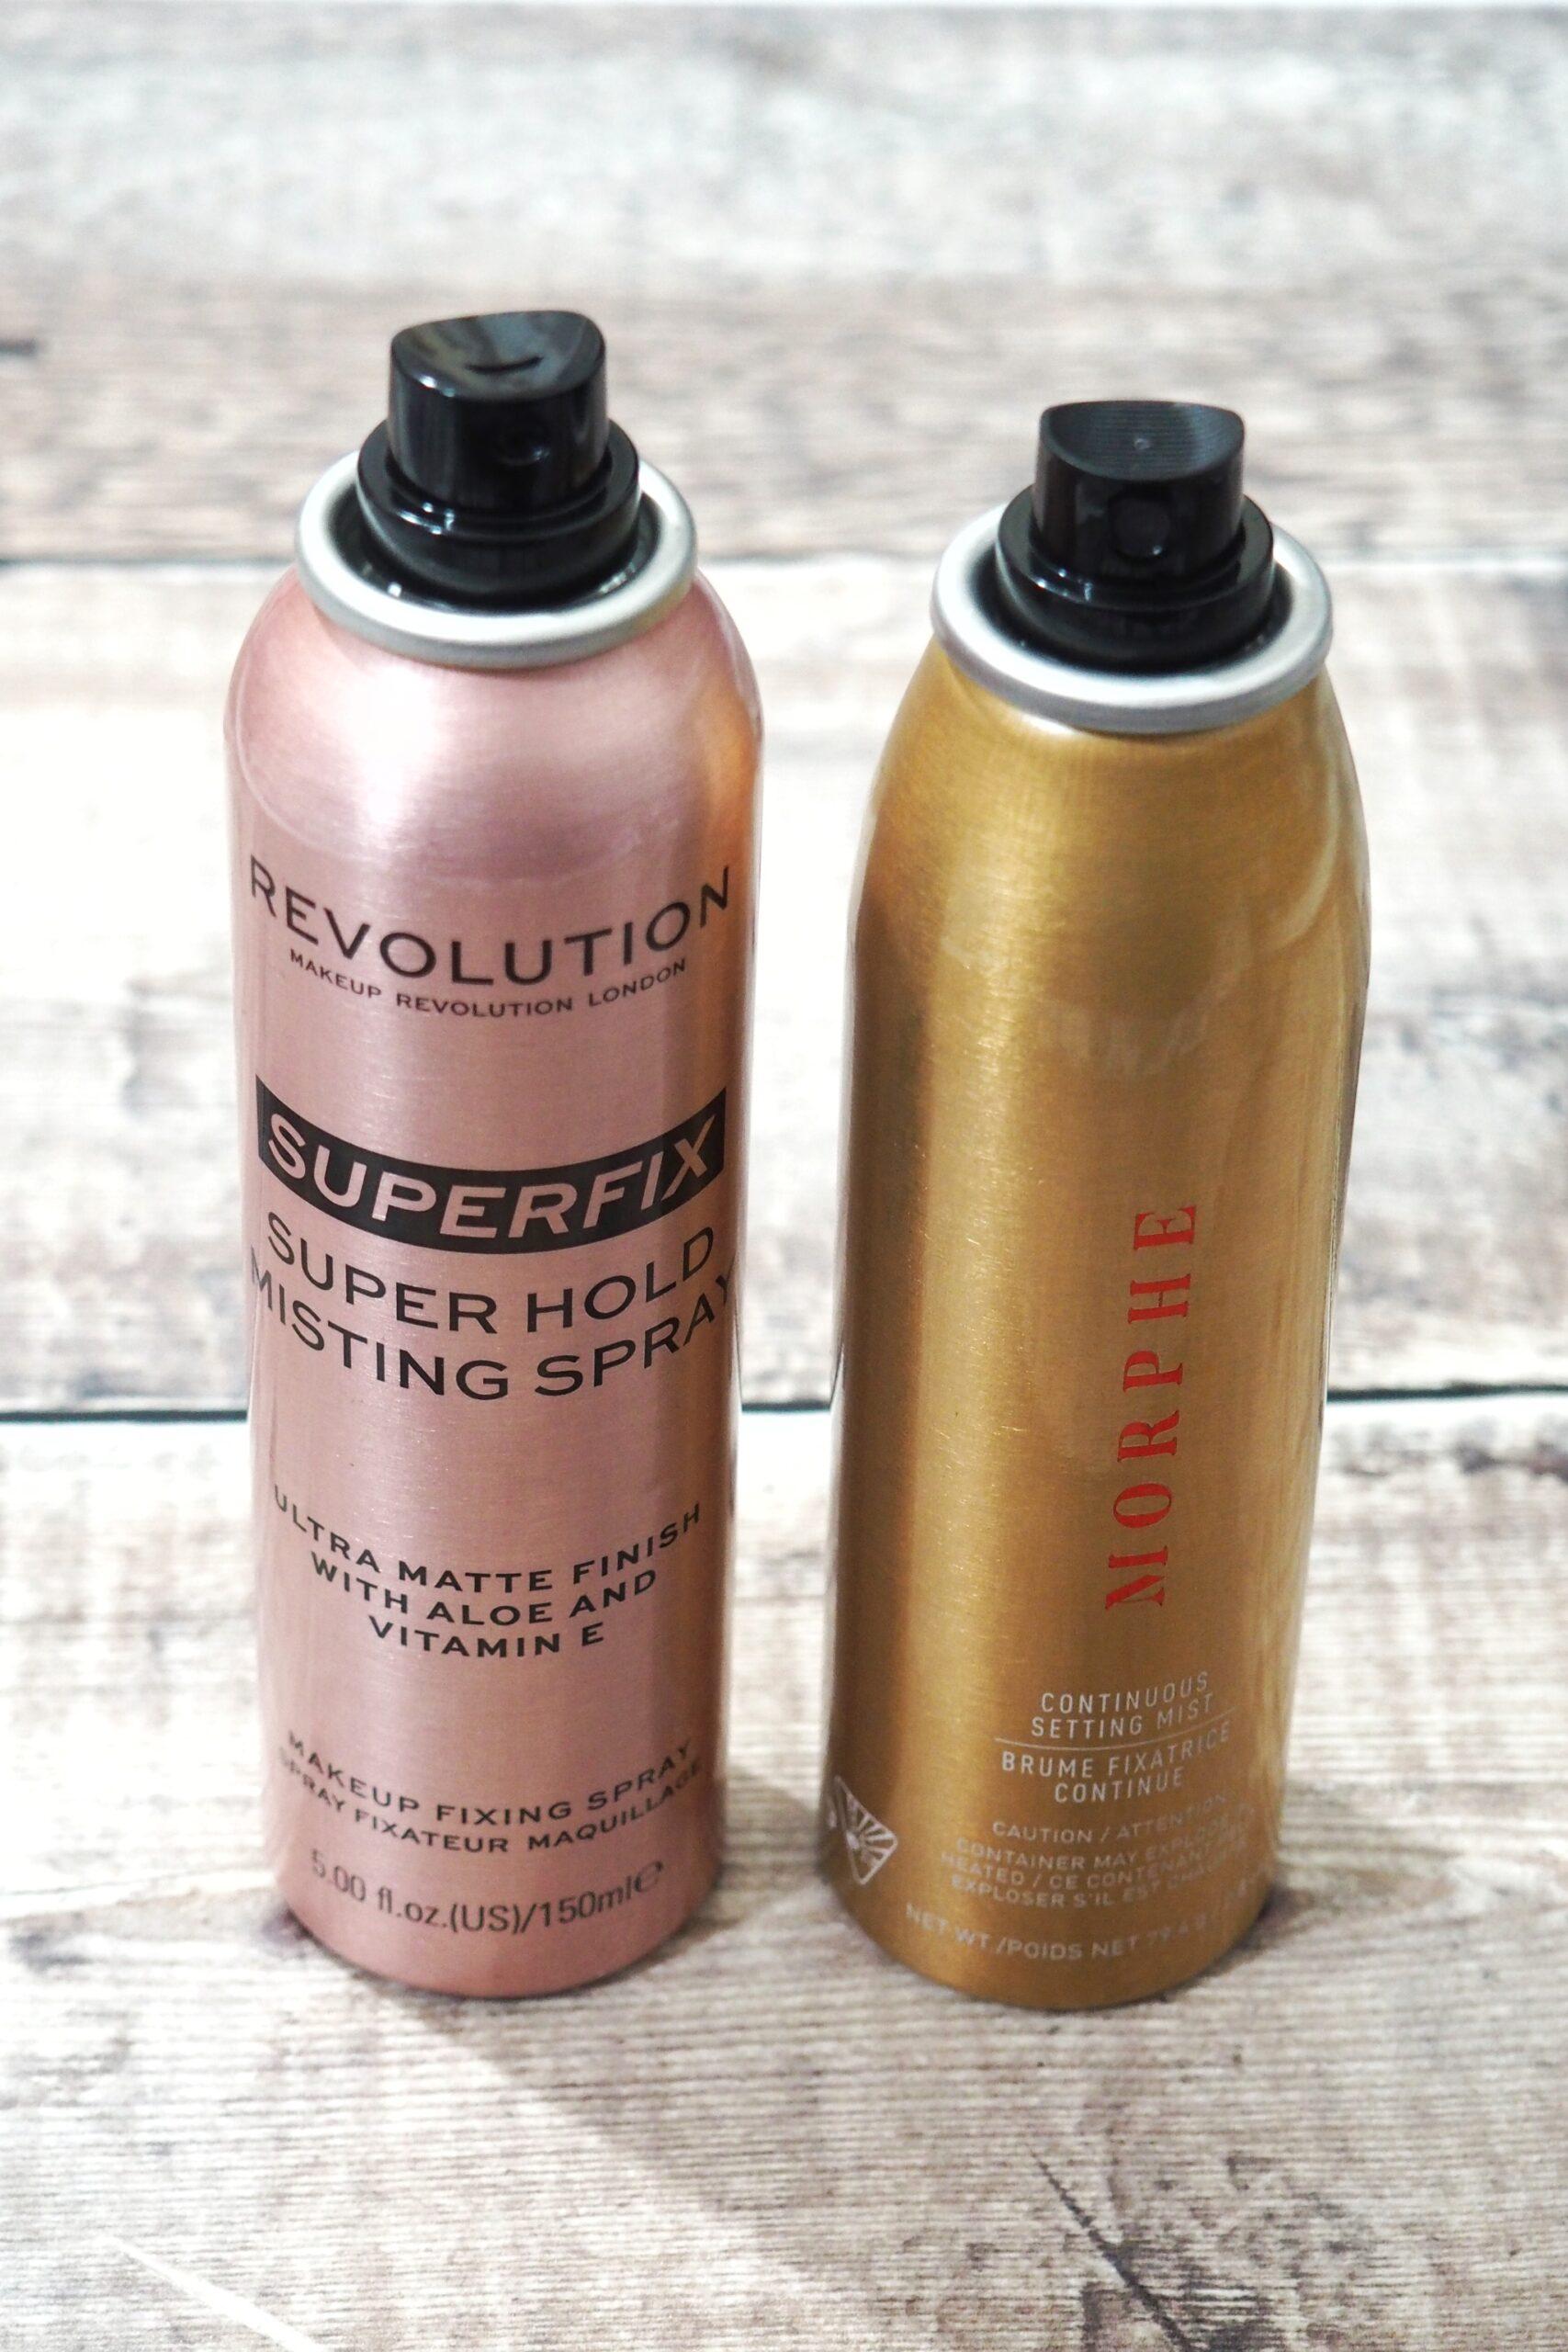 Revolution Superfix Super Hold Misting Spray | Morphe Dupe!?